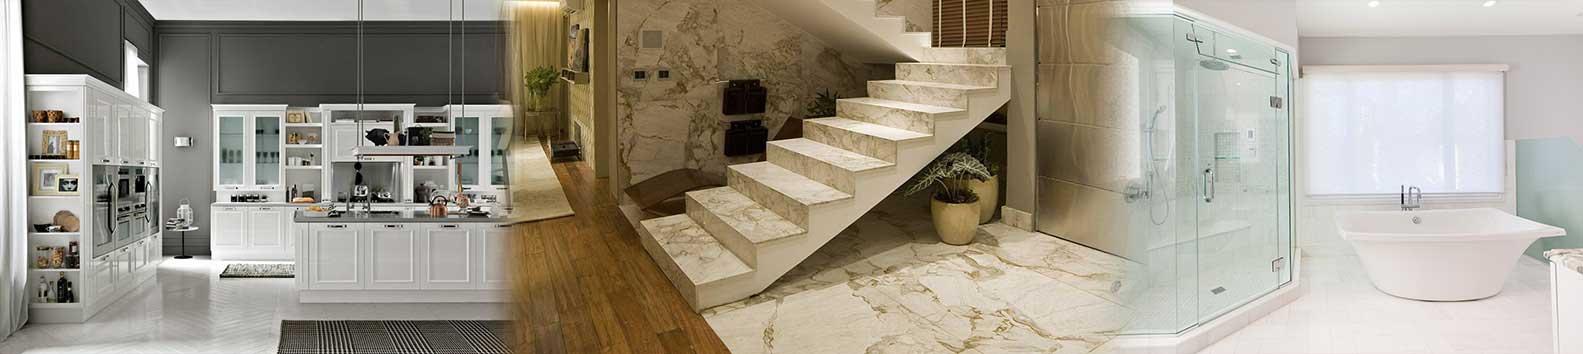 Kitchen bathroom gallery wood flooring remodeling for Kitchen design 07631